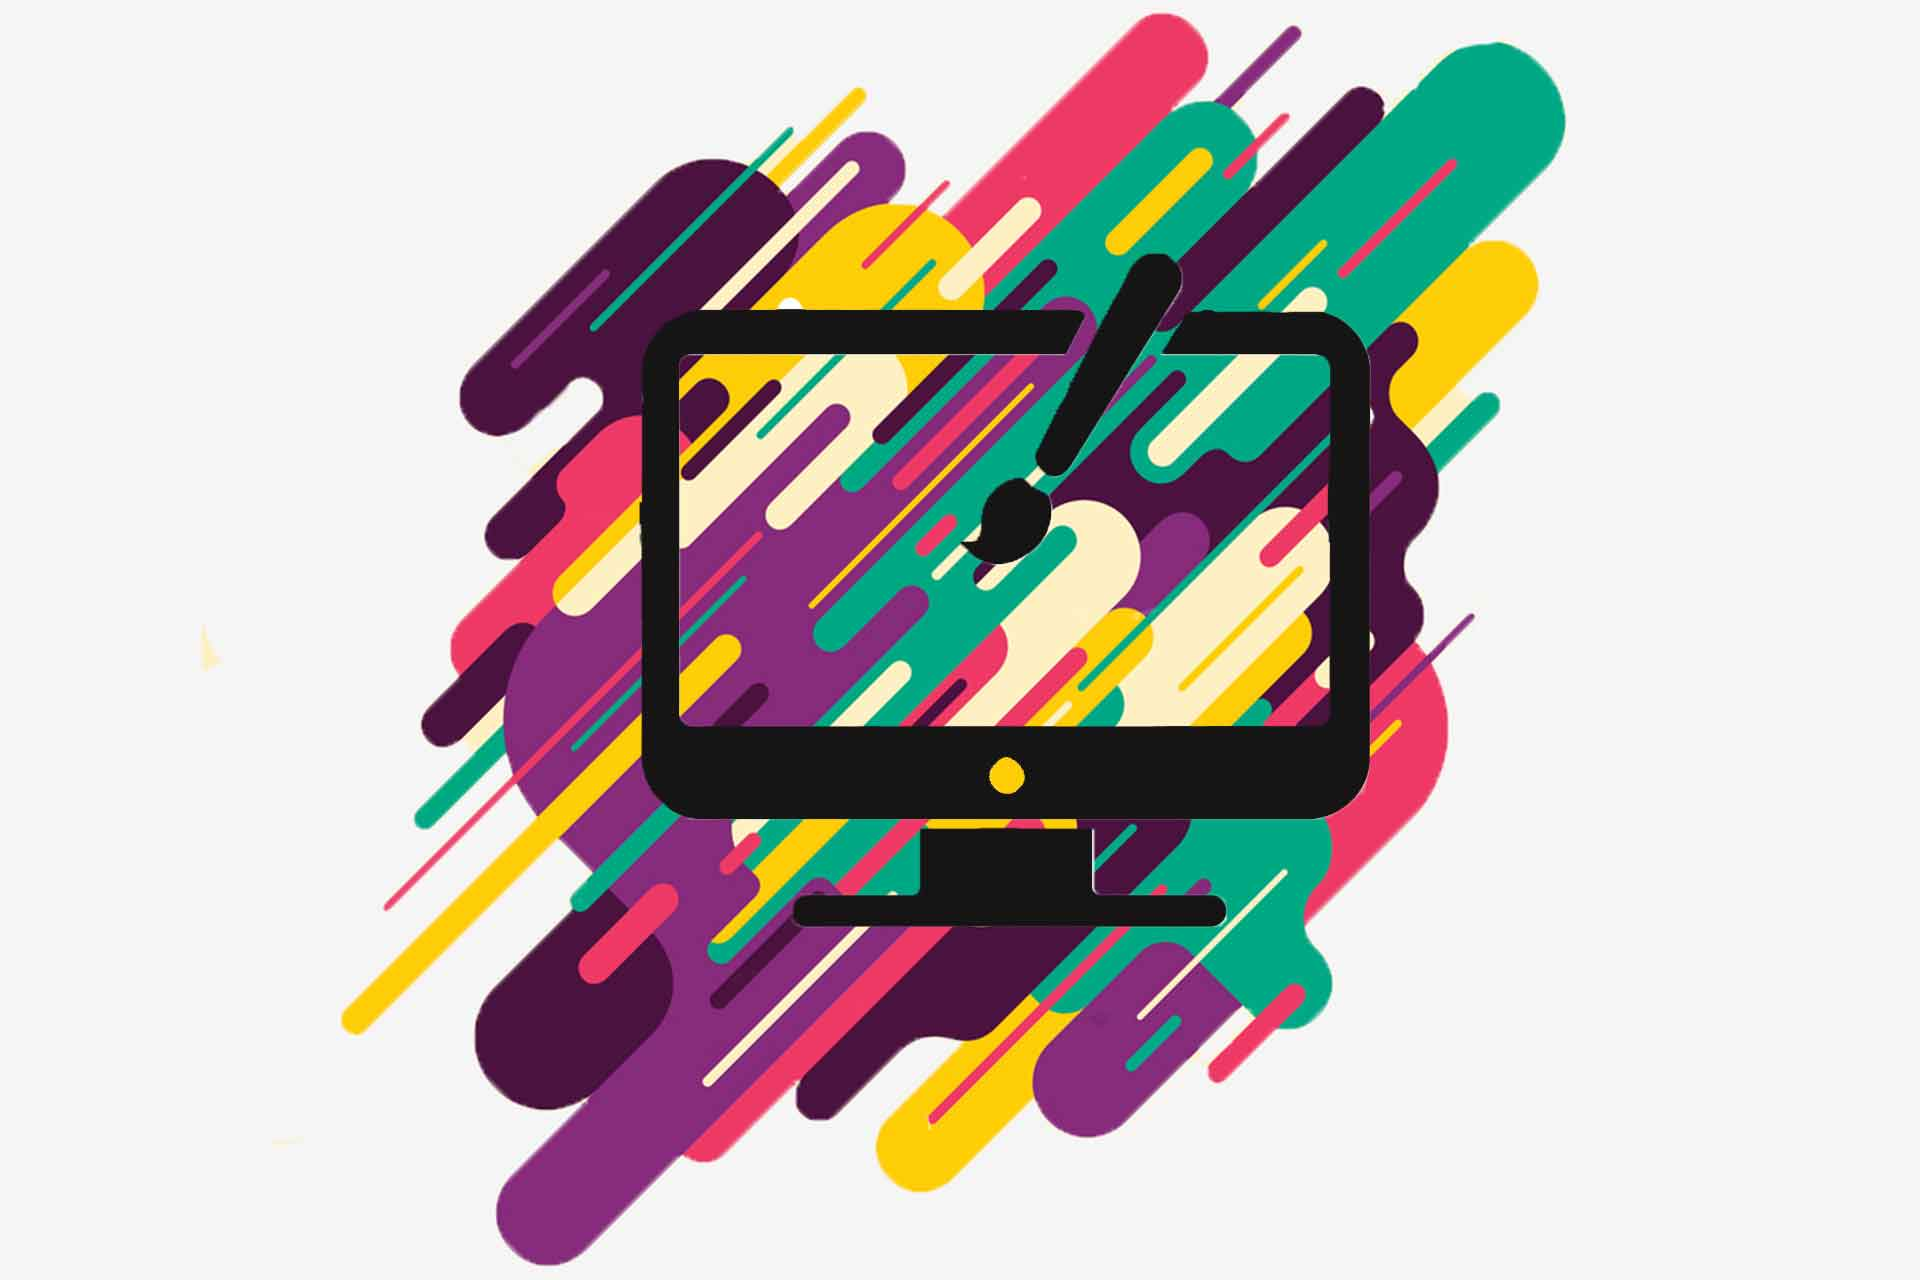 طراحی پاورپوینت حرفهای: گرافیک و رنگ